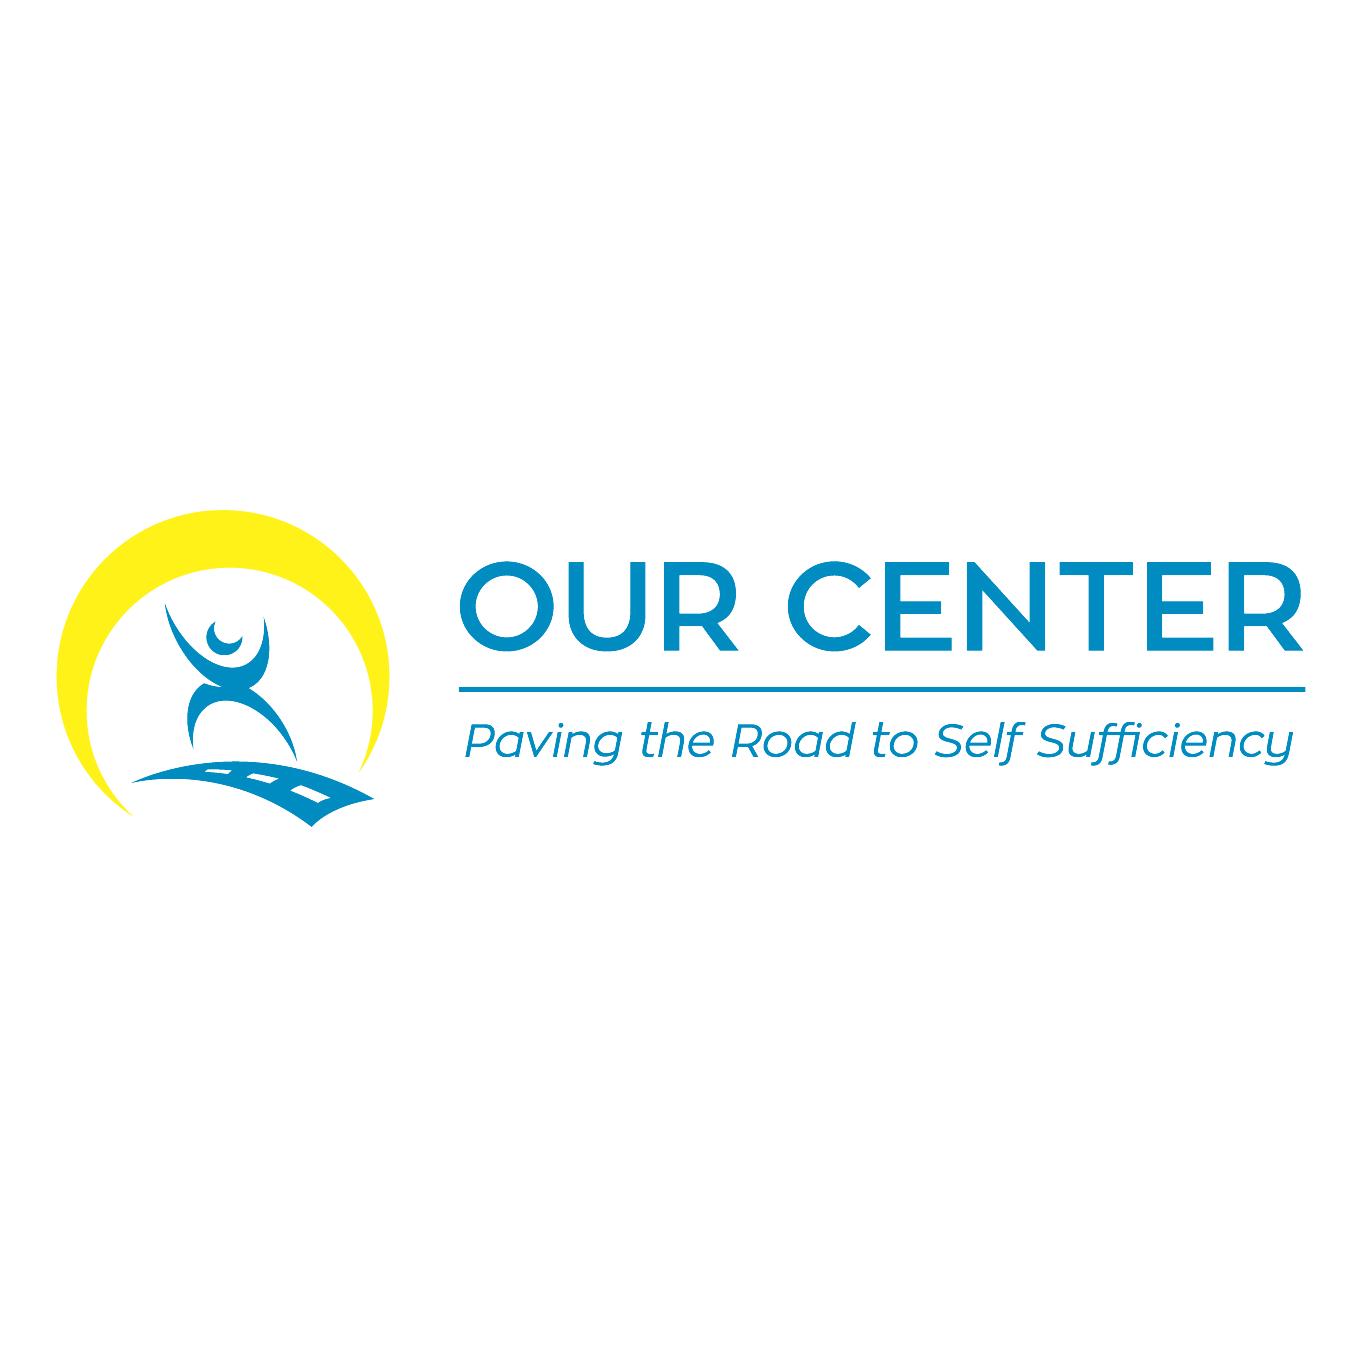 Our Center